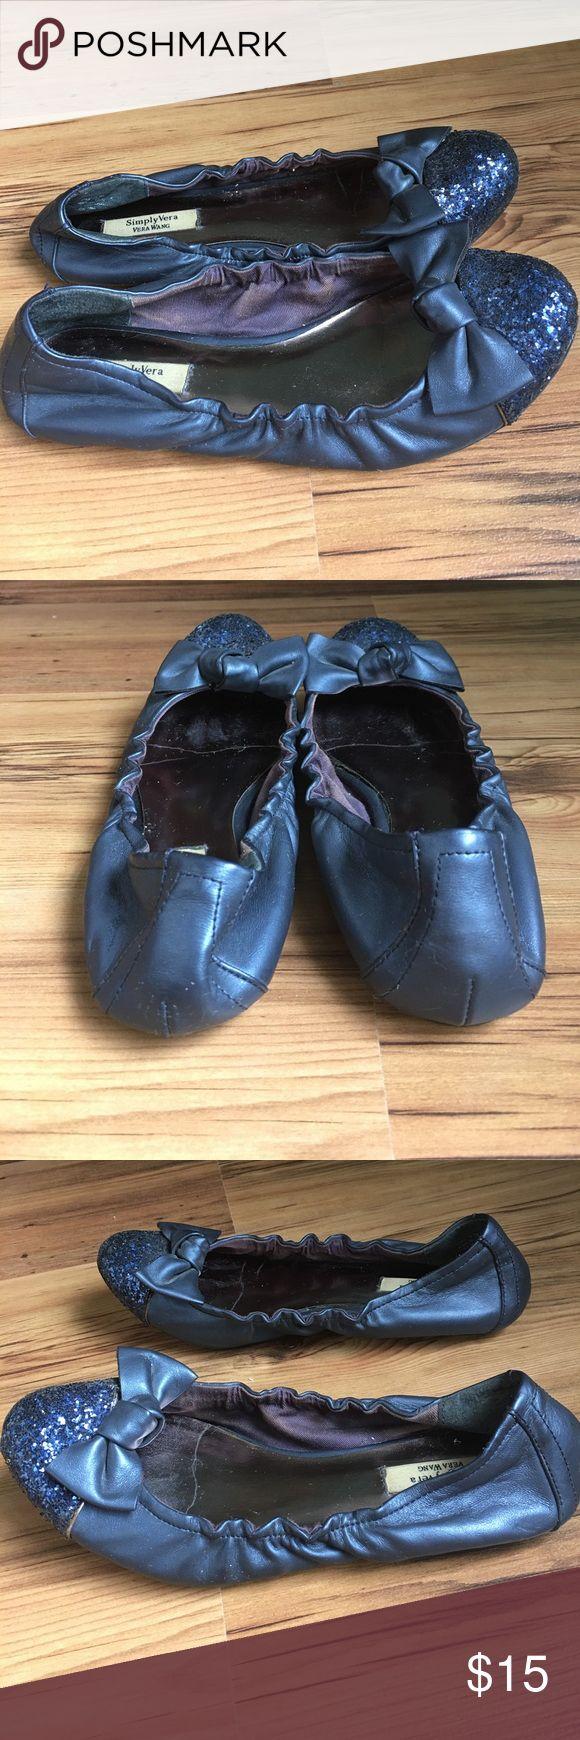 Vera Wang Navy Ballet Flats Simply Vera Vera Wang Navy blue flats embellished with glitter and bow details Vera Wang Shoes Flats & Loafers